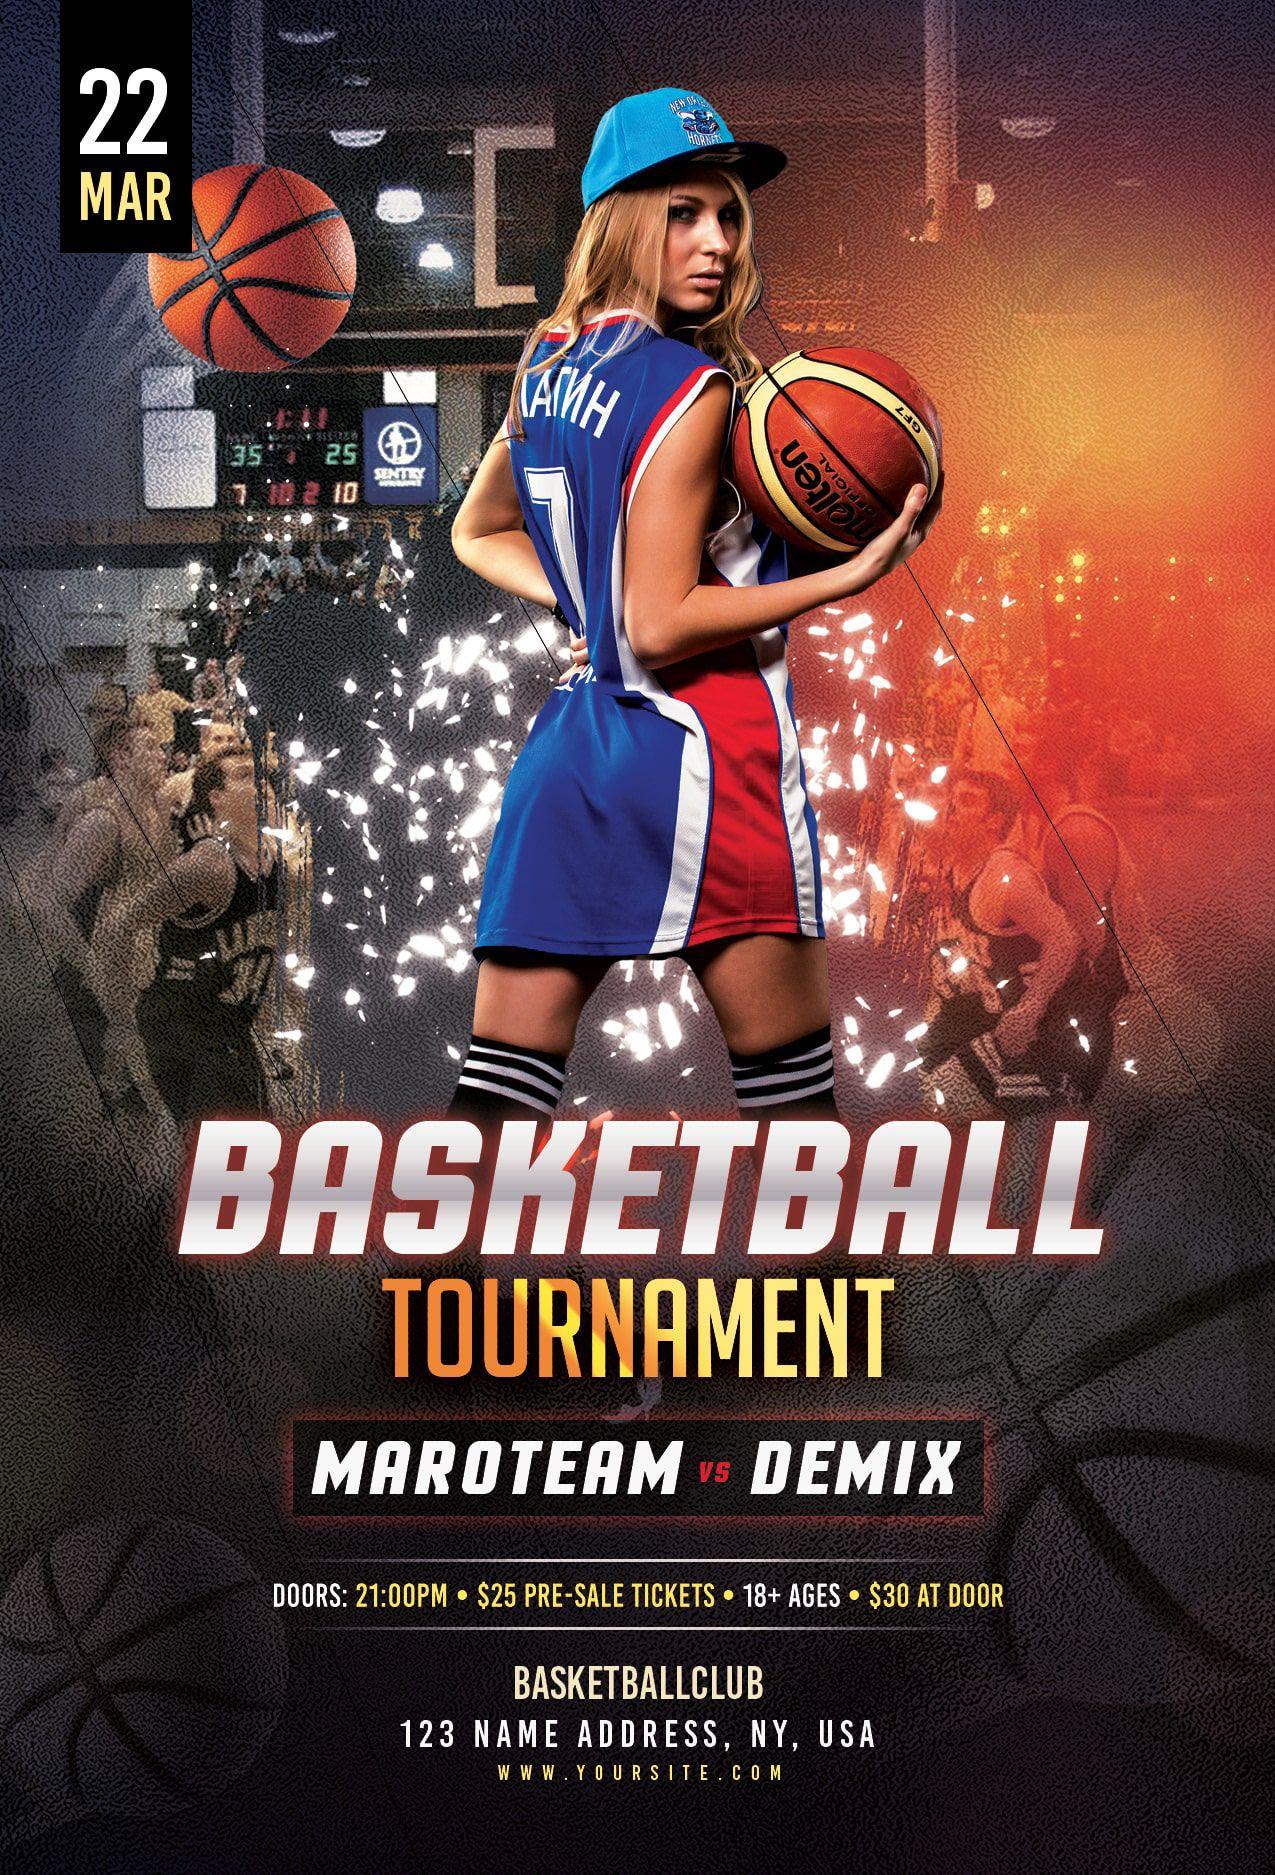 000 Unbelievable Basketball Tournament Flyer Template Sample  3 On FreeFull